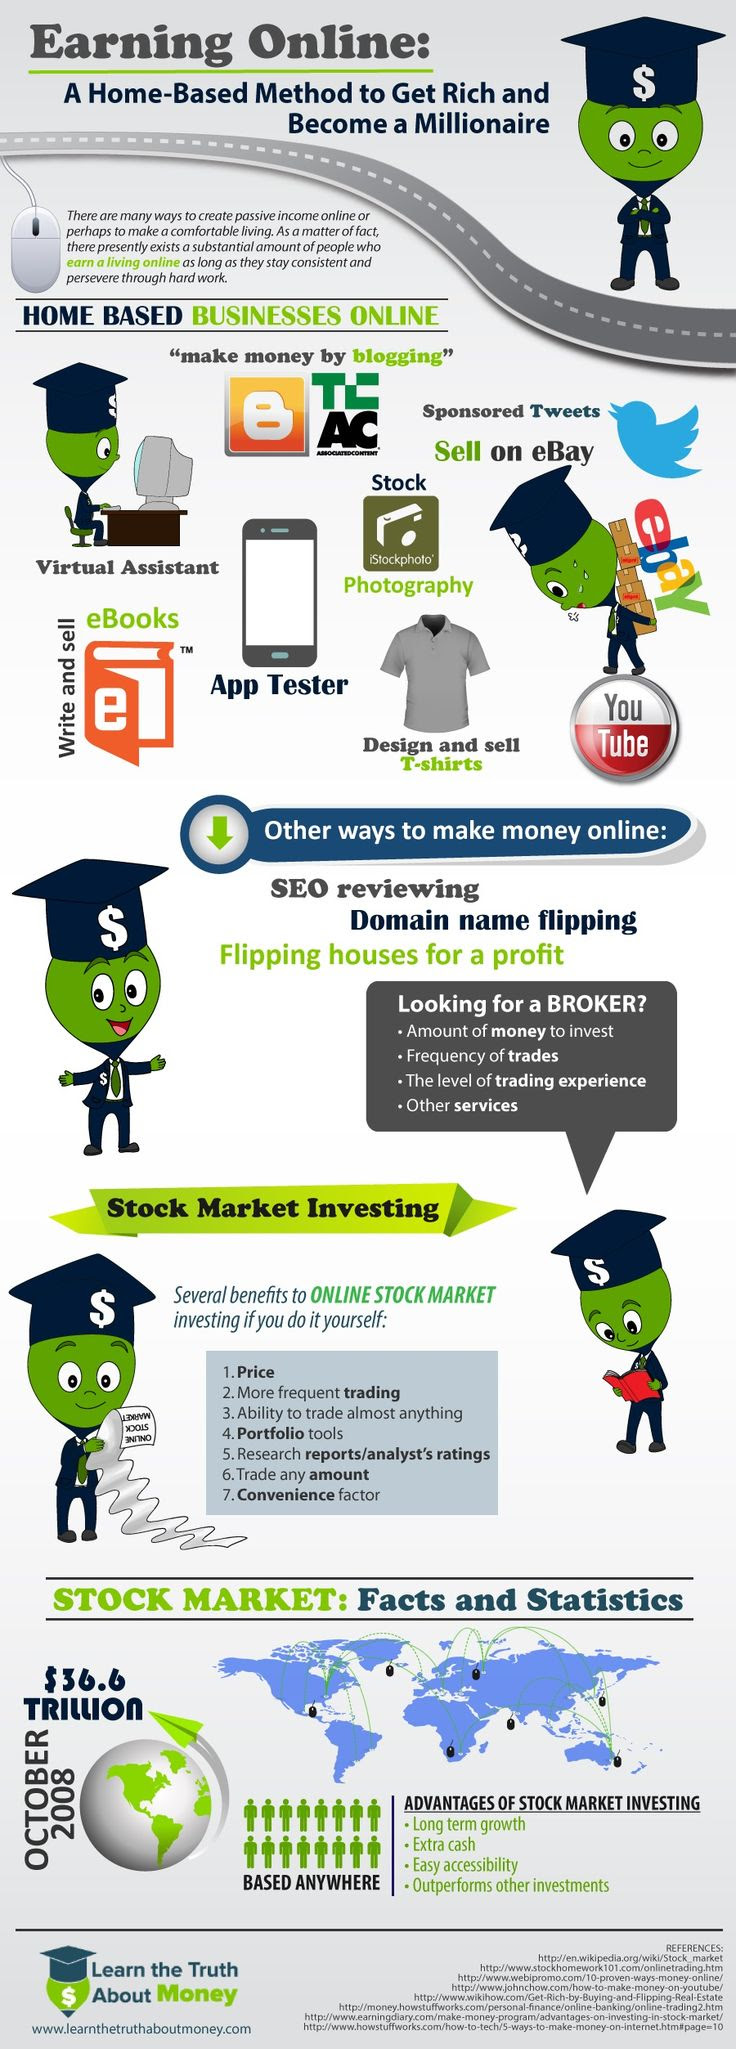 Earn Money Online - infographic